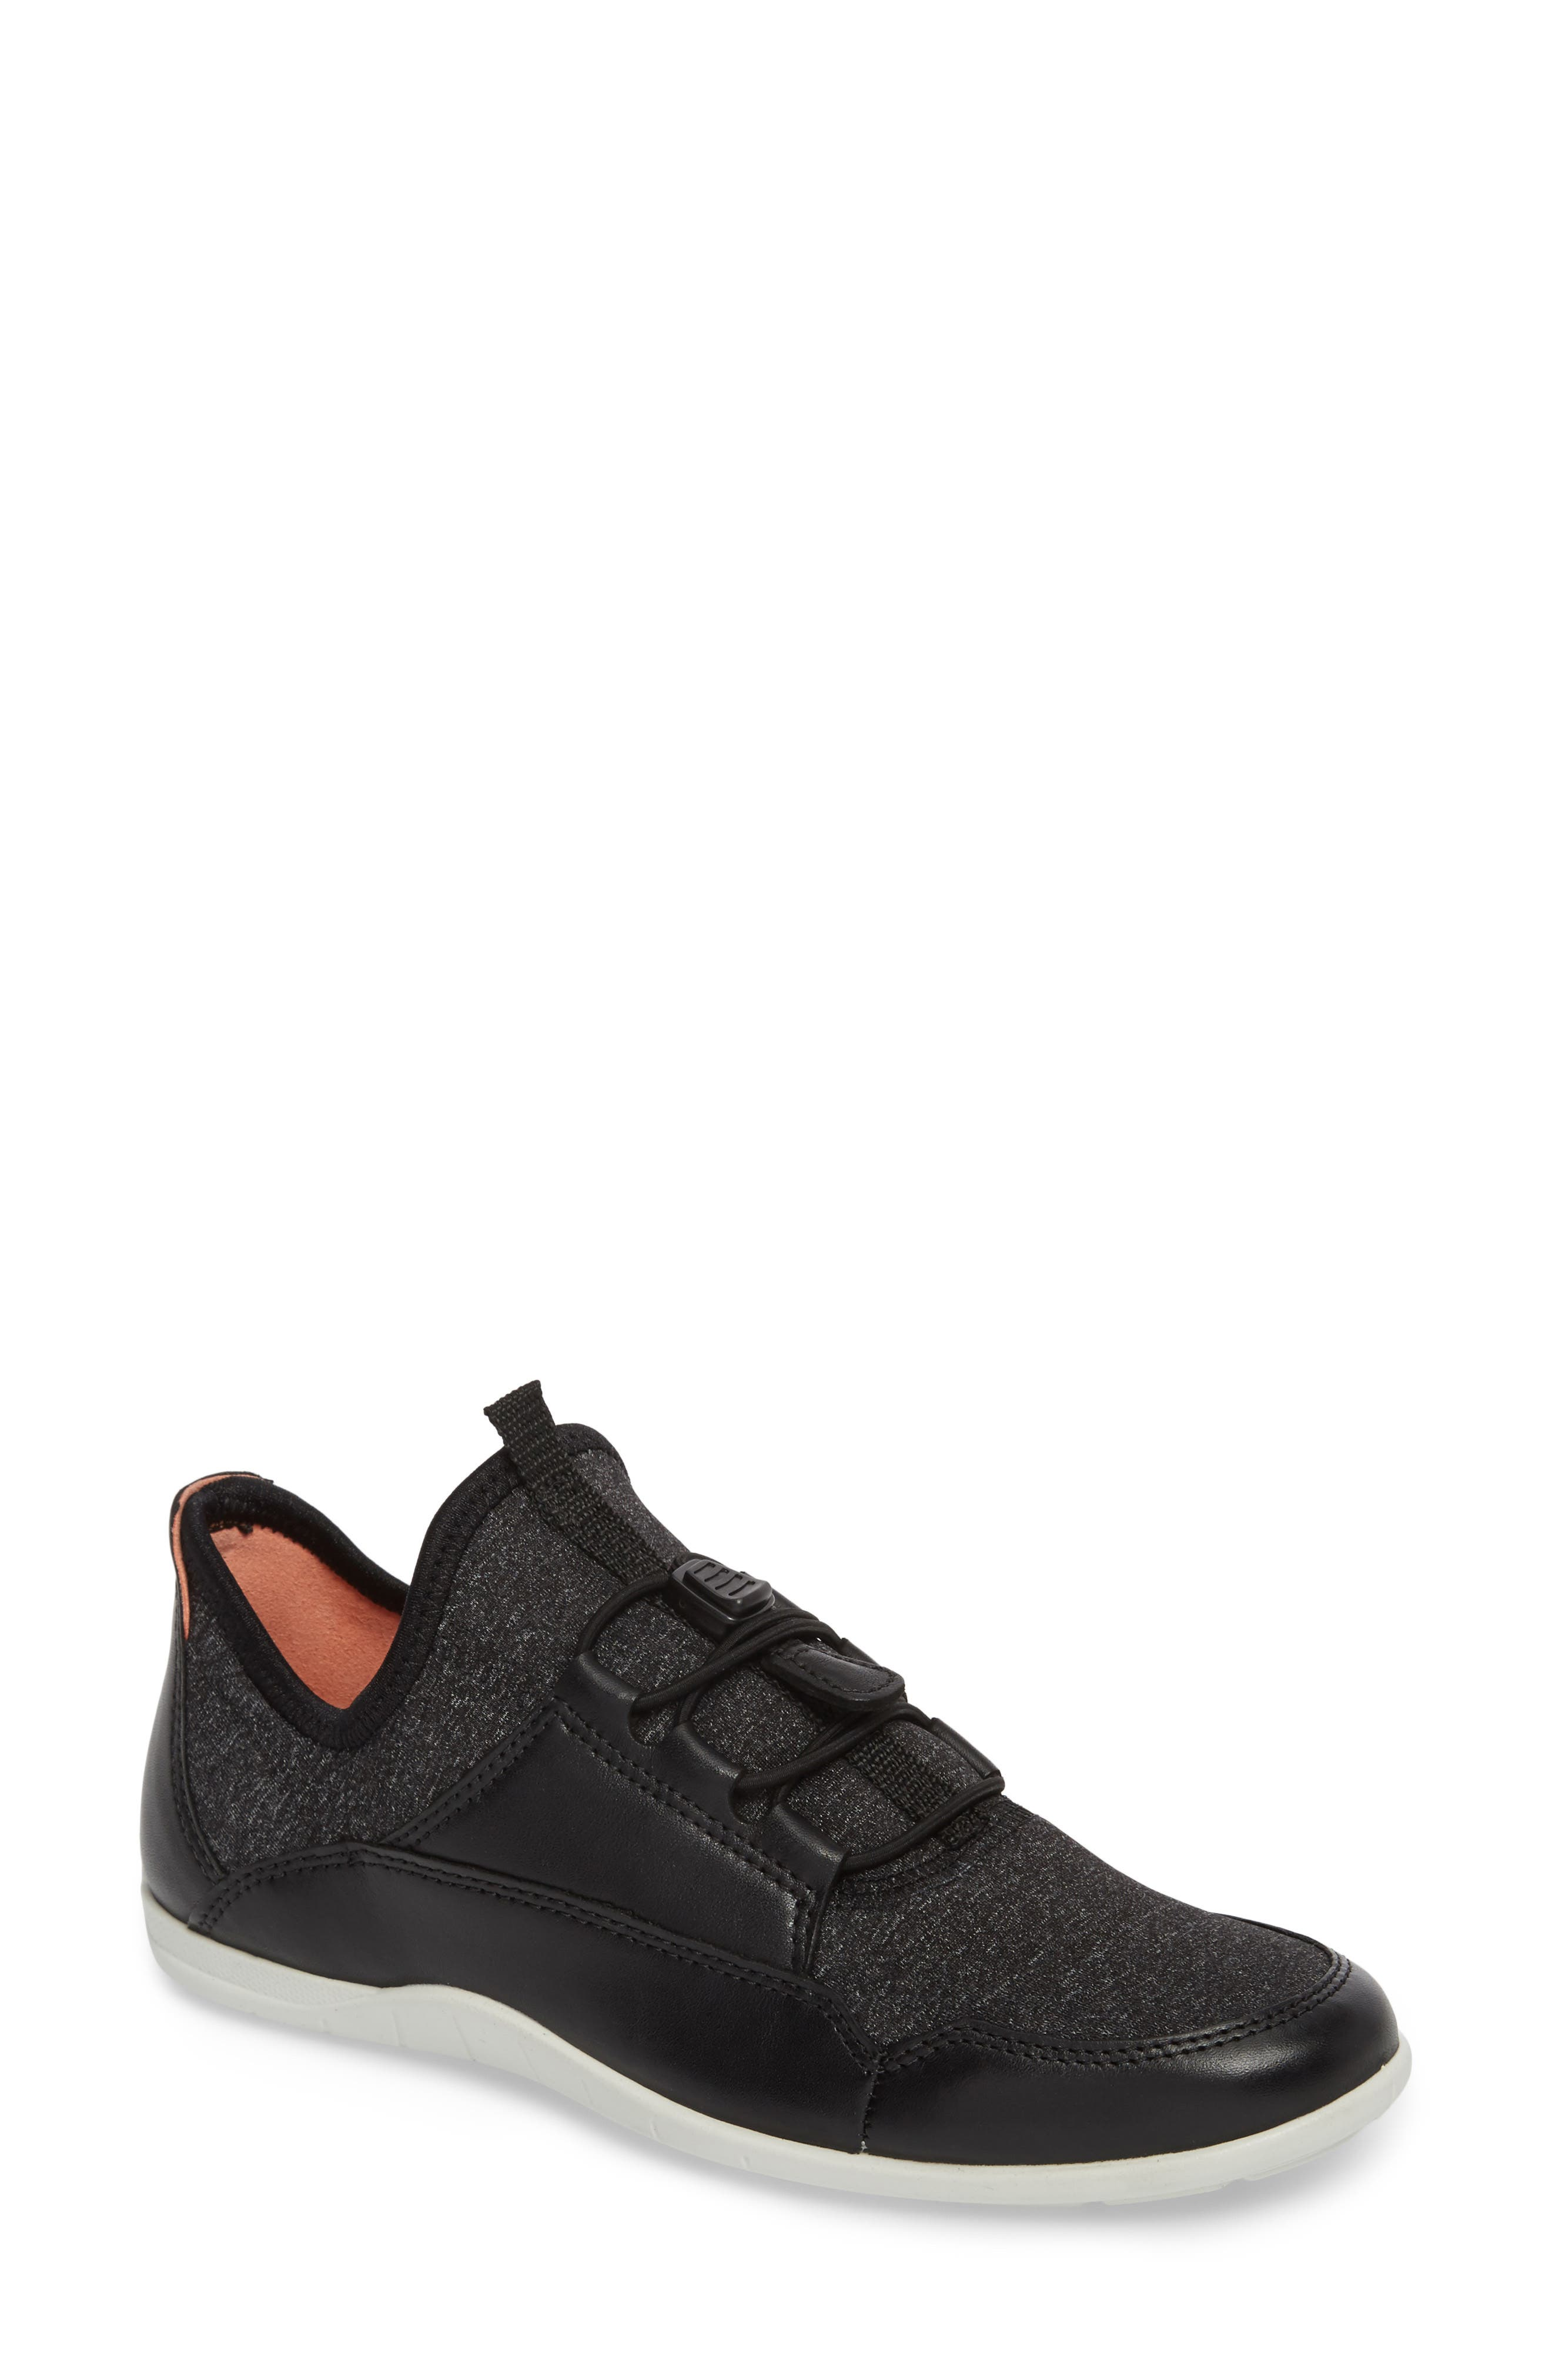 Bluma Speedlace Sneaker,                             Main thumbnail 1, color,                             001